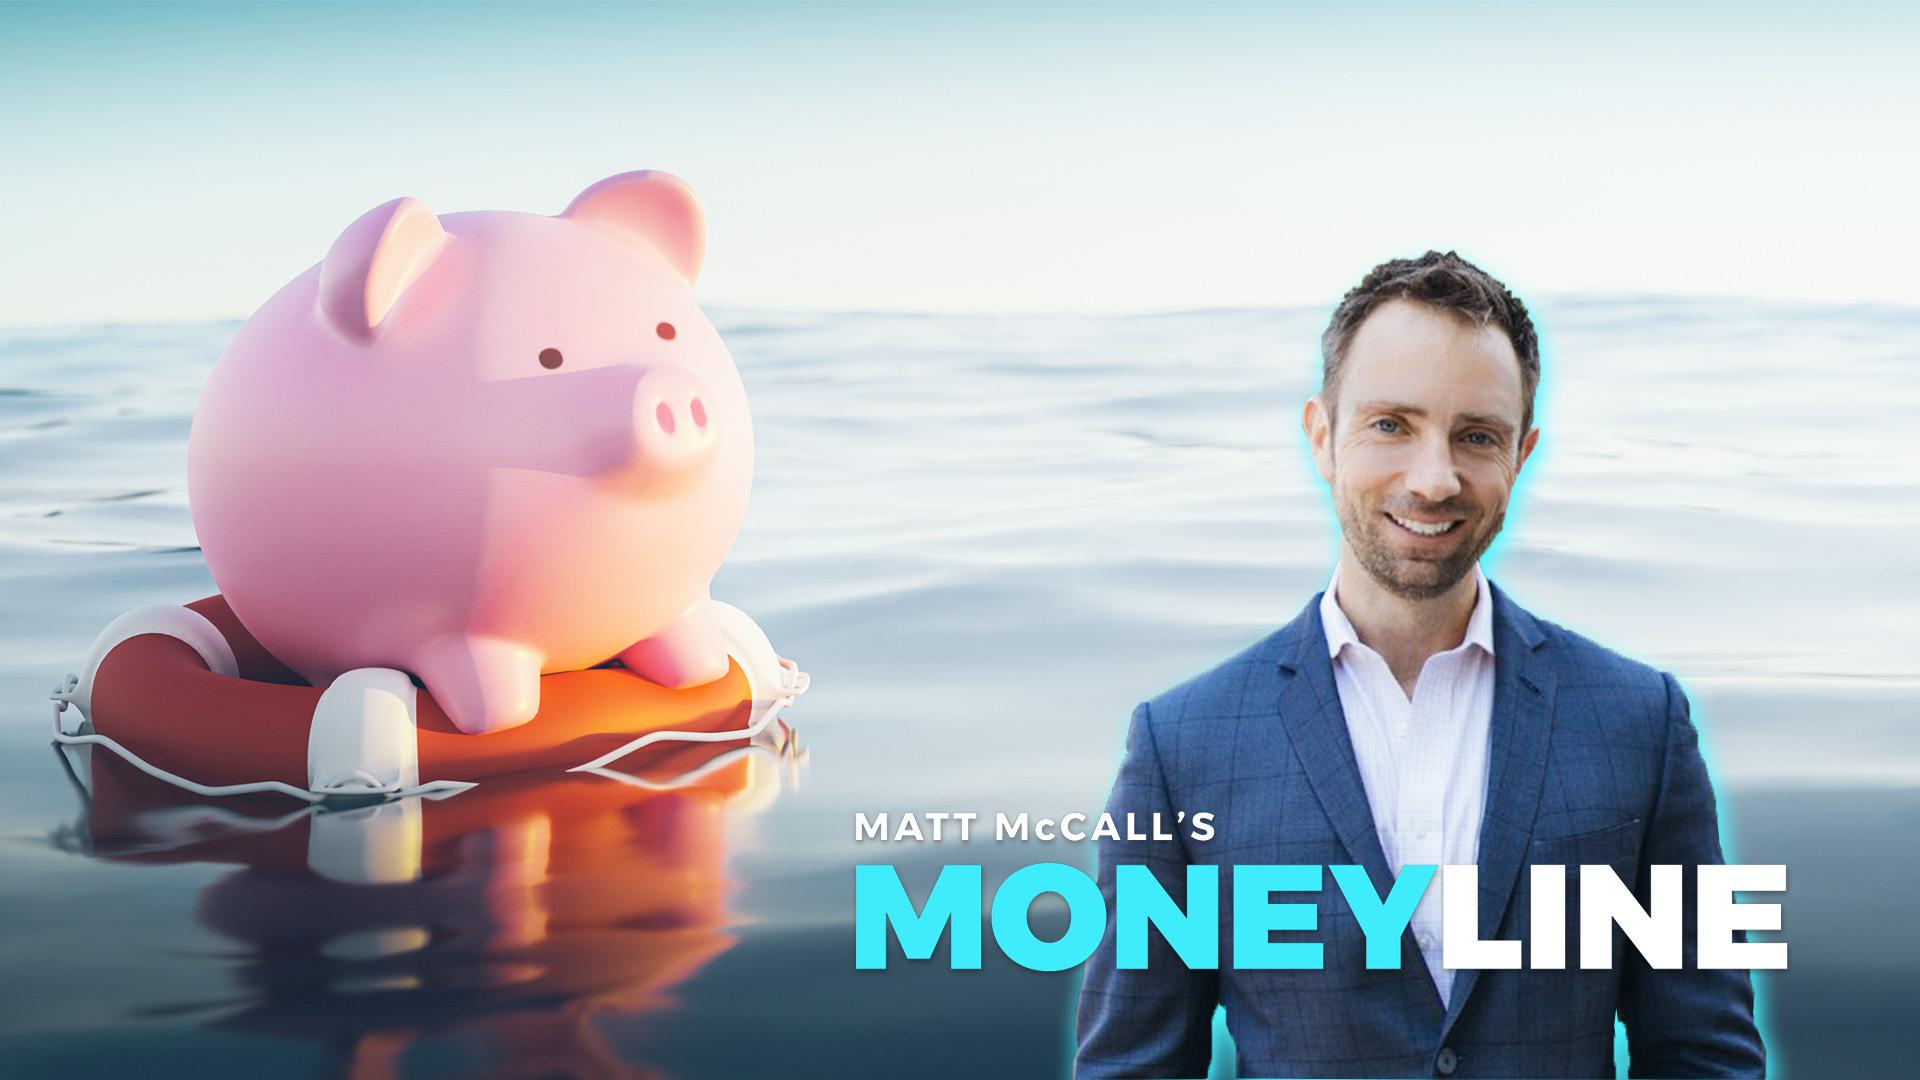 Matt McCall's Moneyline: Stocks that Survive the Downturn